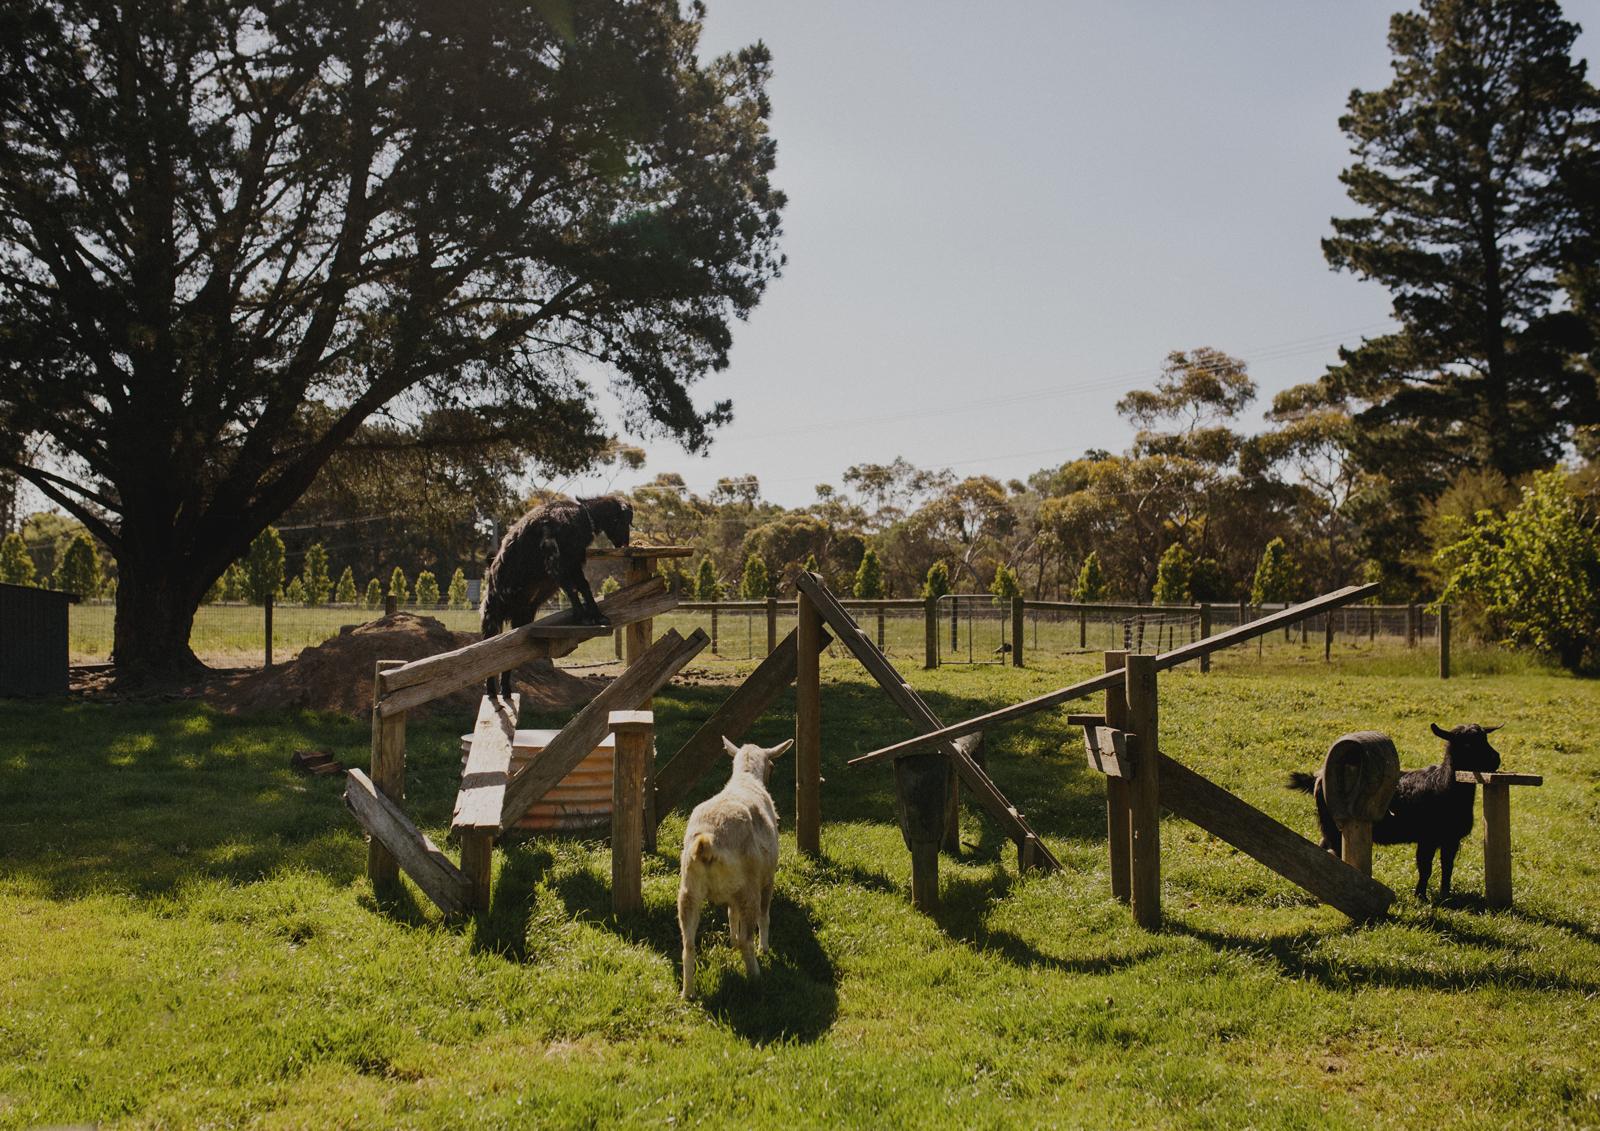 The goats at Benton Rise Farm on the Mornington Peninsula